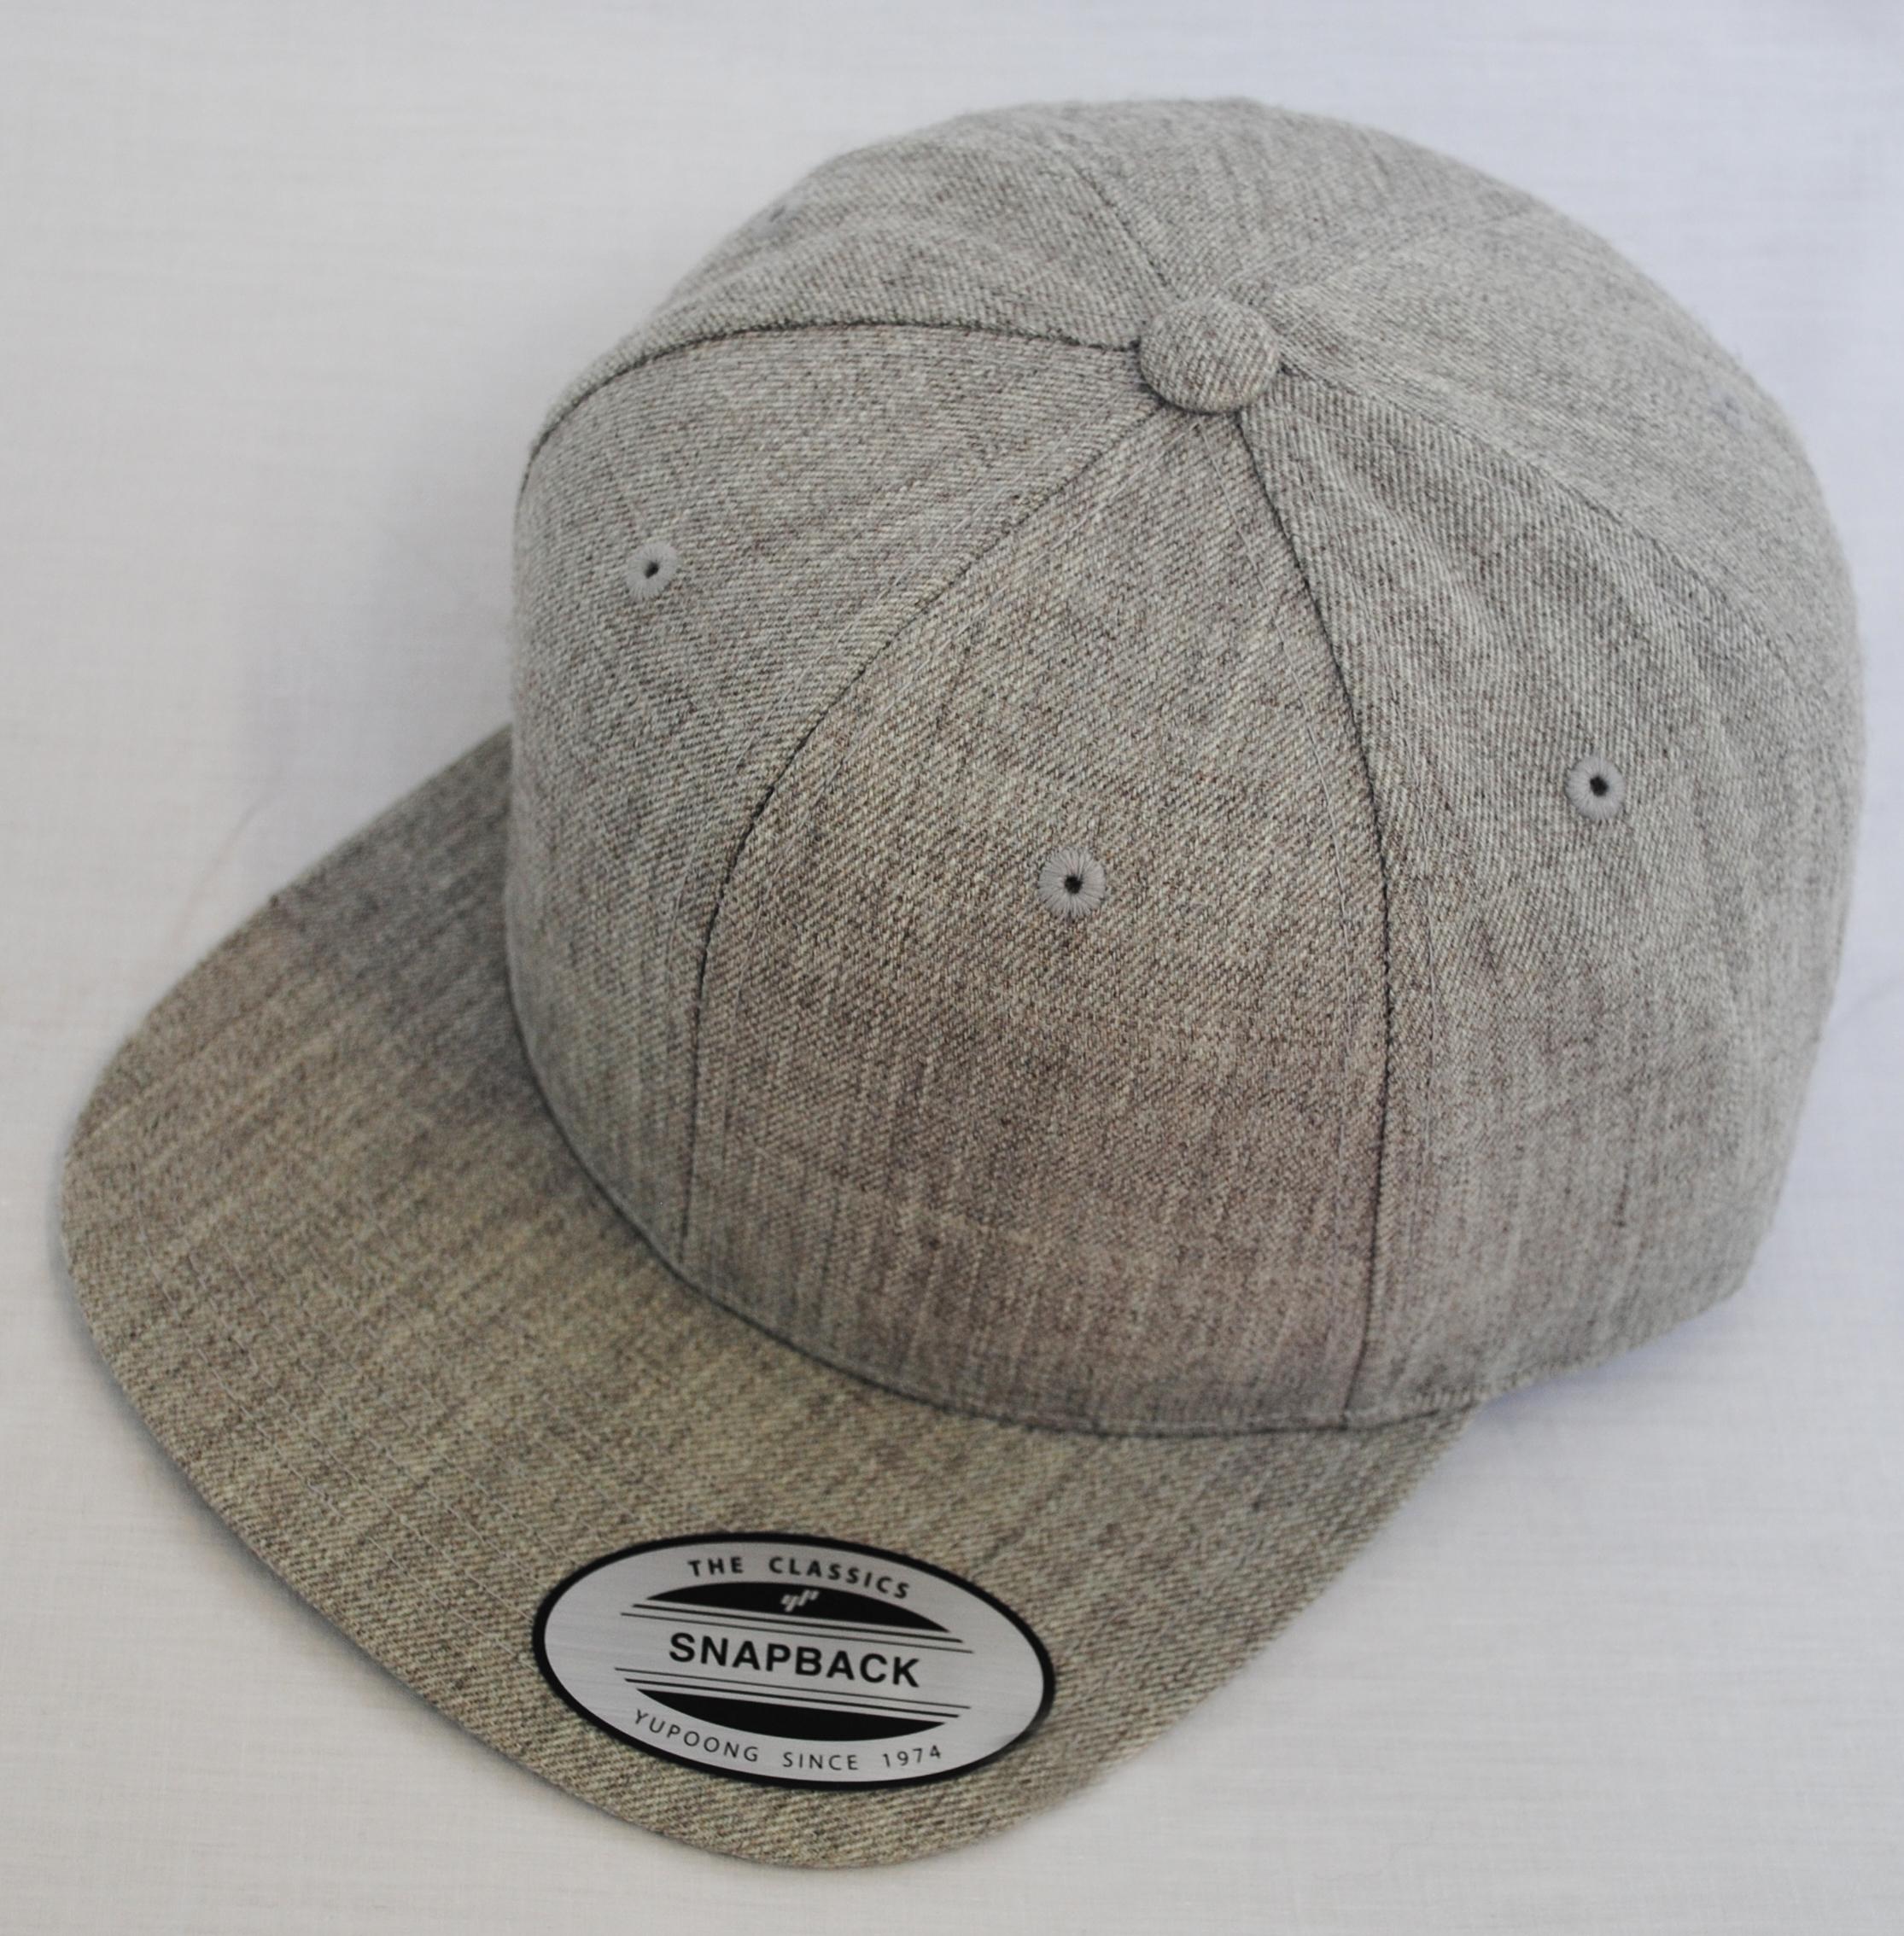 3f37acd61a2c2 NEW PLAIN FLAT PEAK RETRO SNAPBACK HAT CAP BLACK